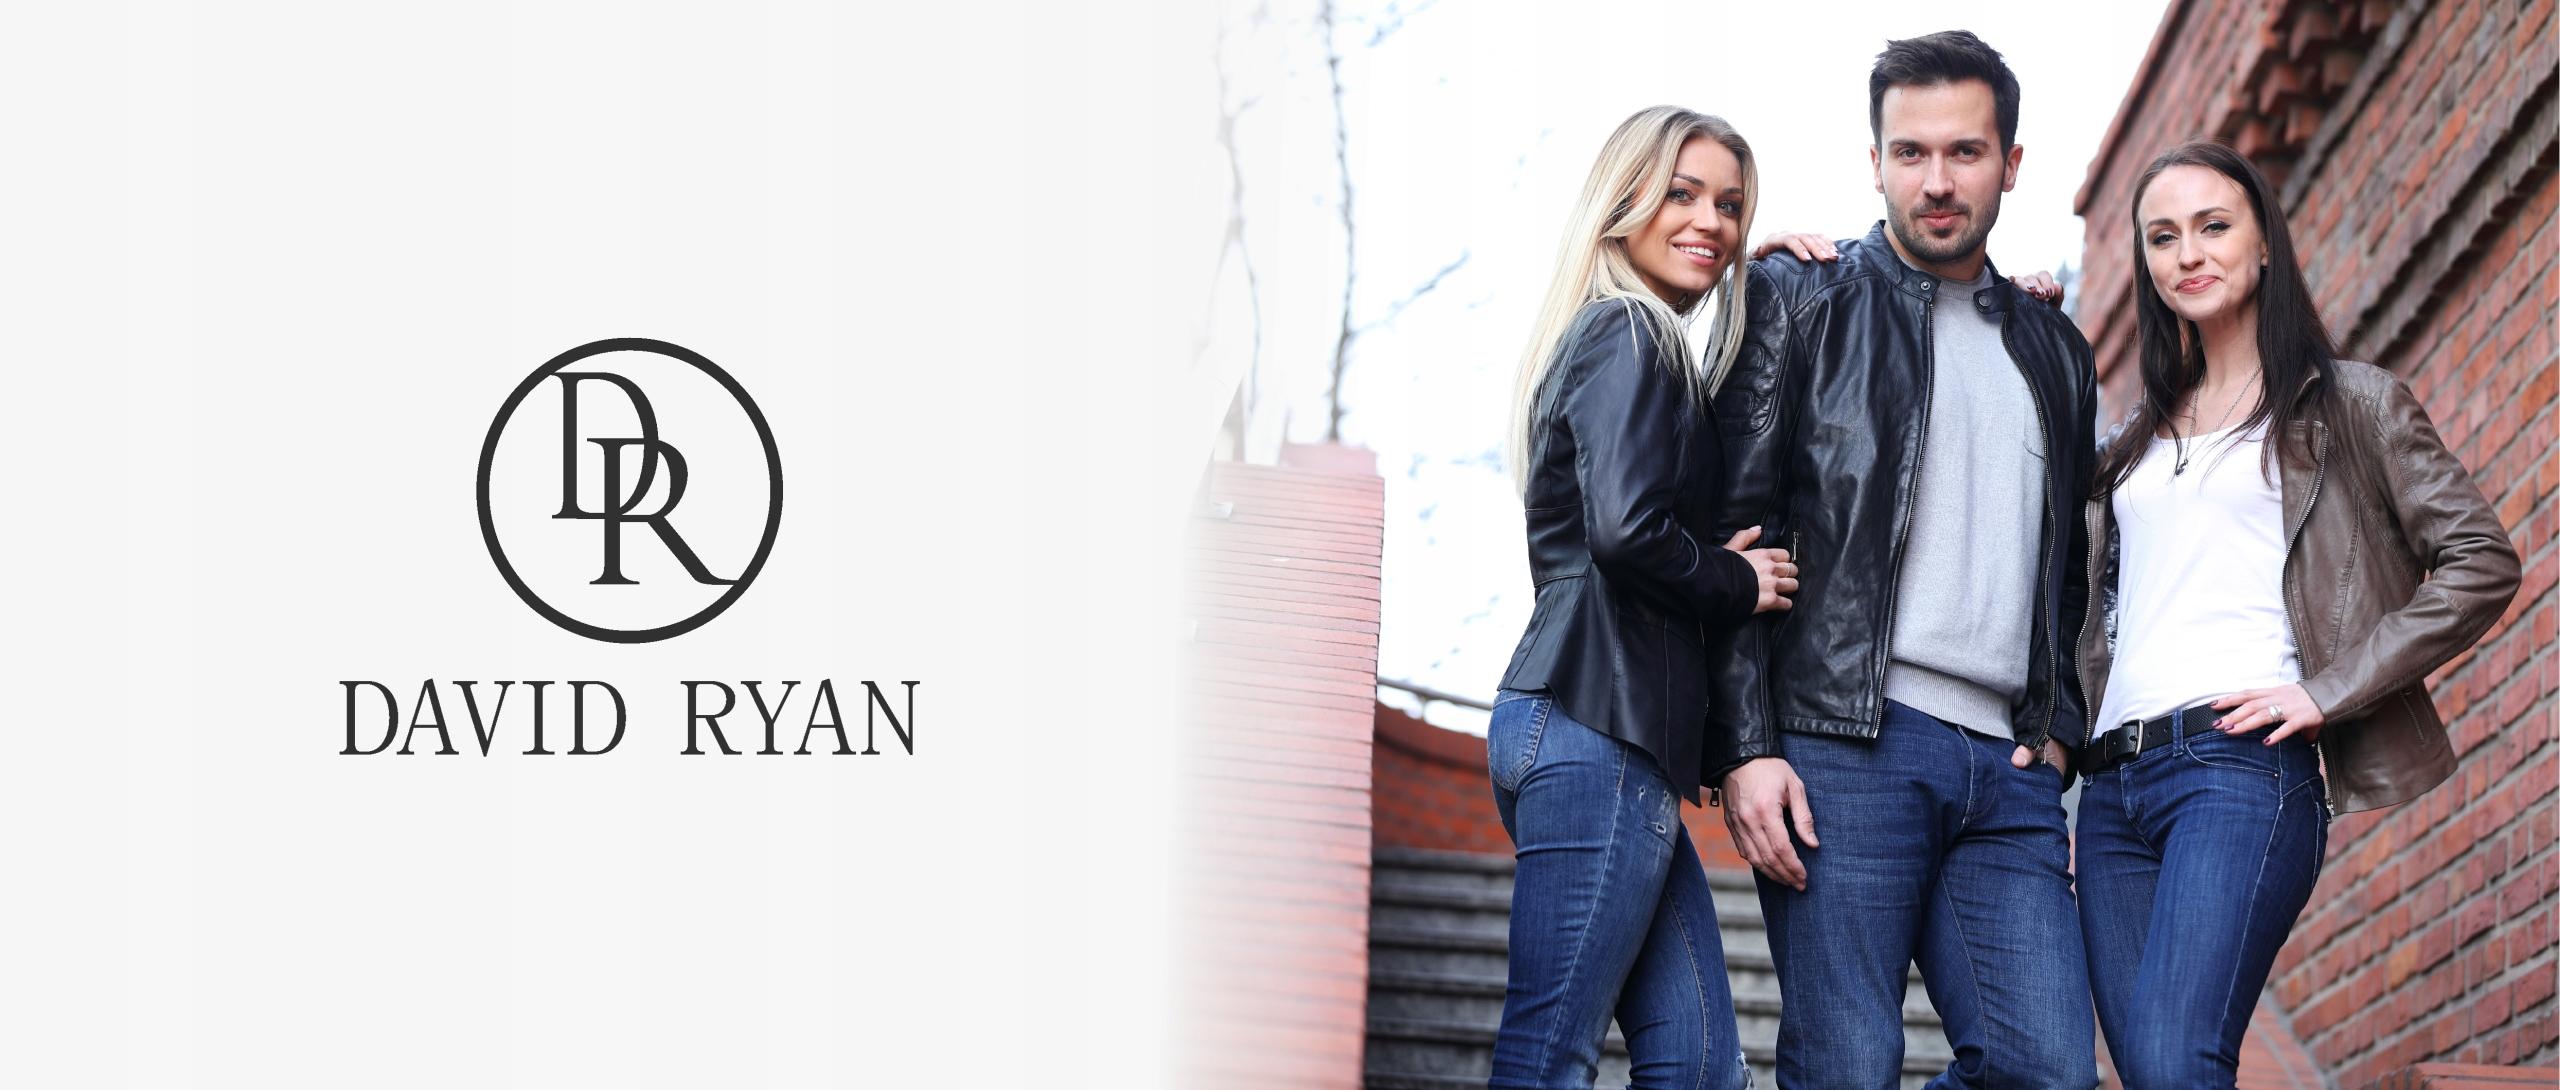 Płaszcz skórzany DAVID RYAN - Brenda - 2XL